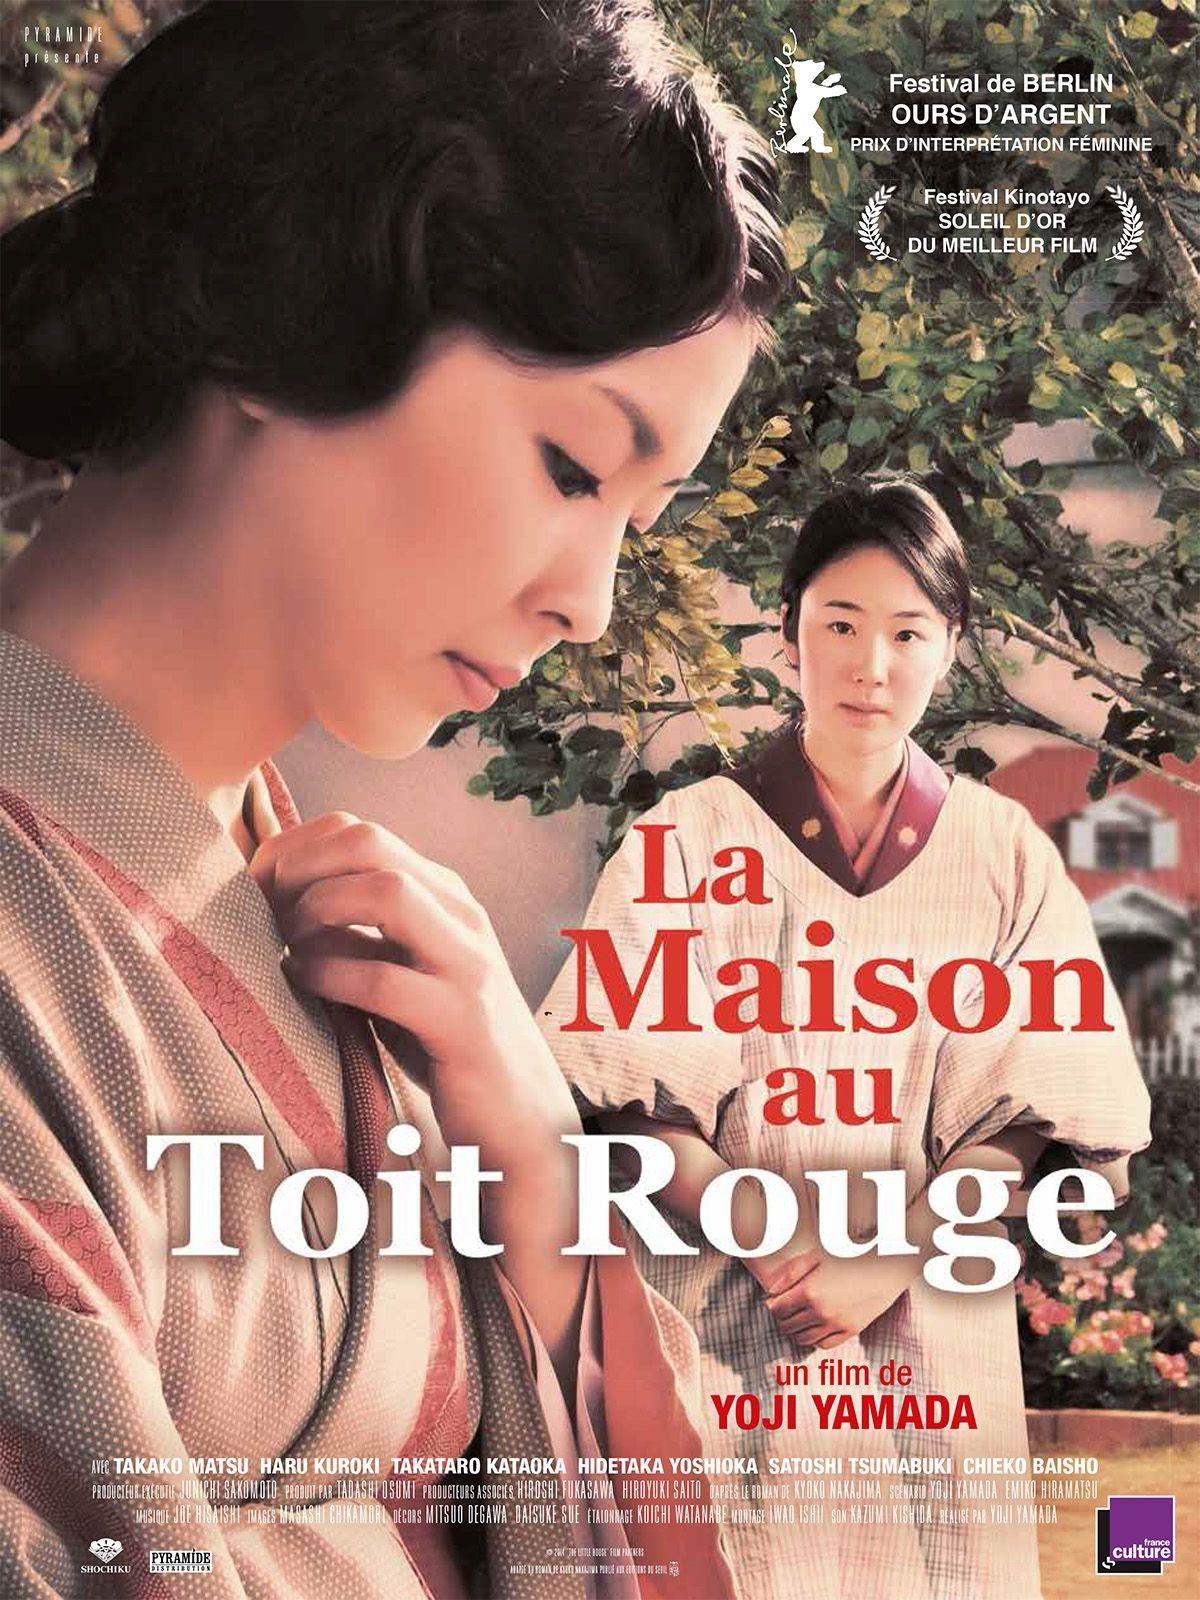 Film Balzac Et La Petite Tailleuse Chinoise Check more at https://www.